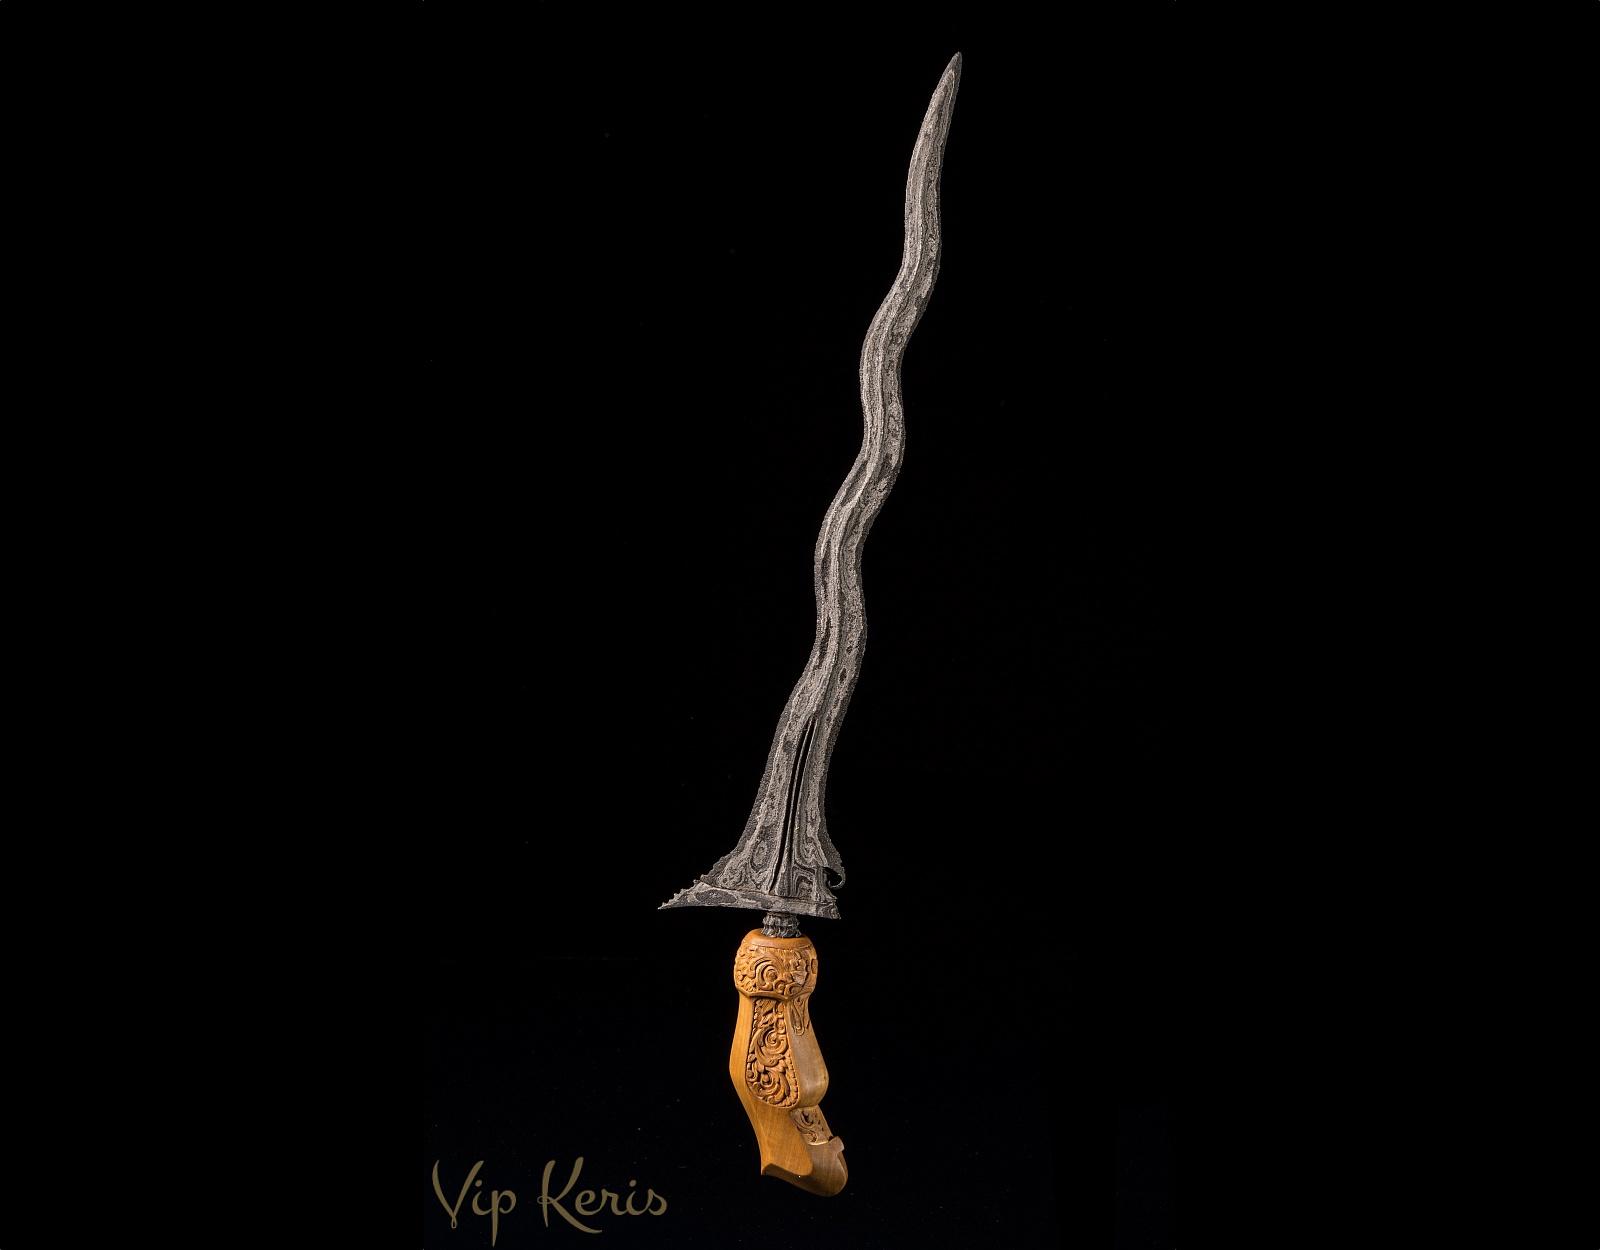 Кинжал Крис Balebang Luk 7 фото VipKeris